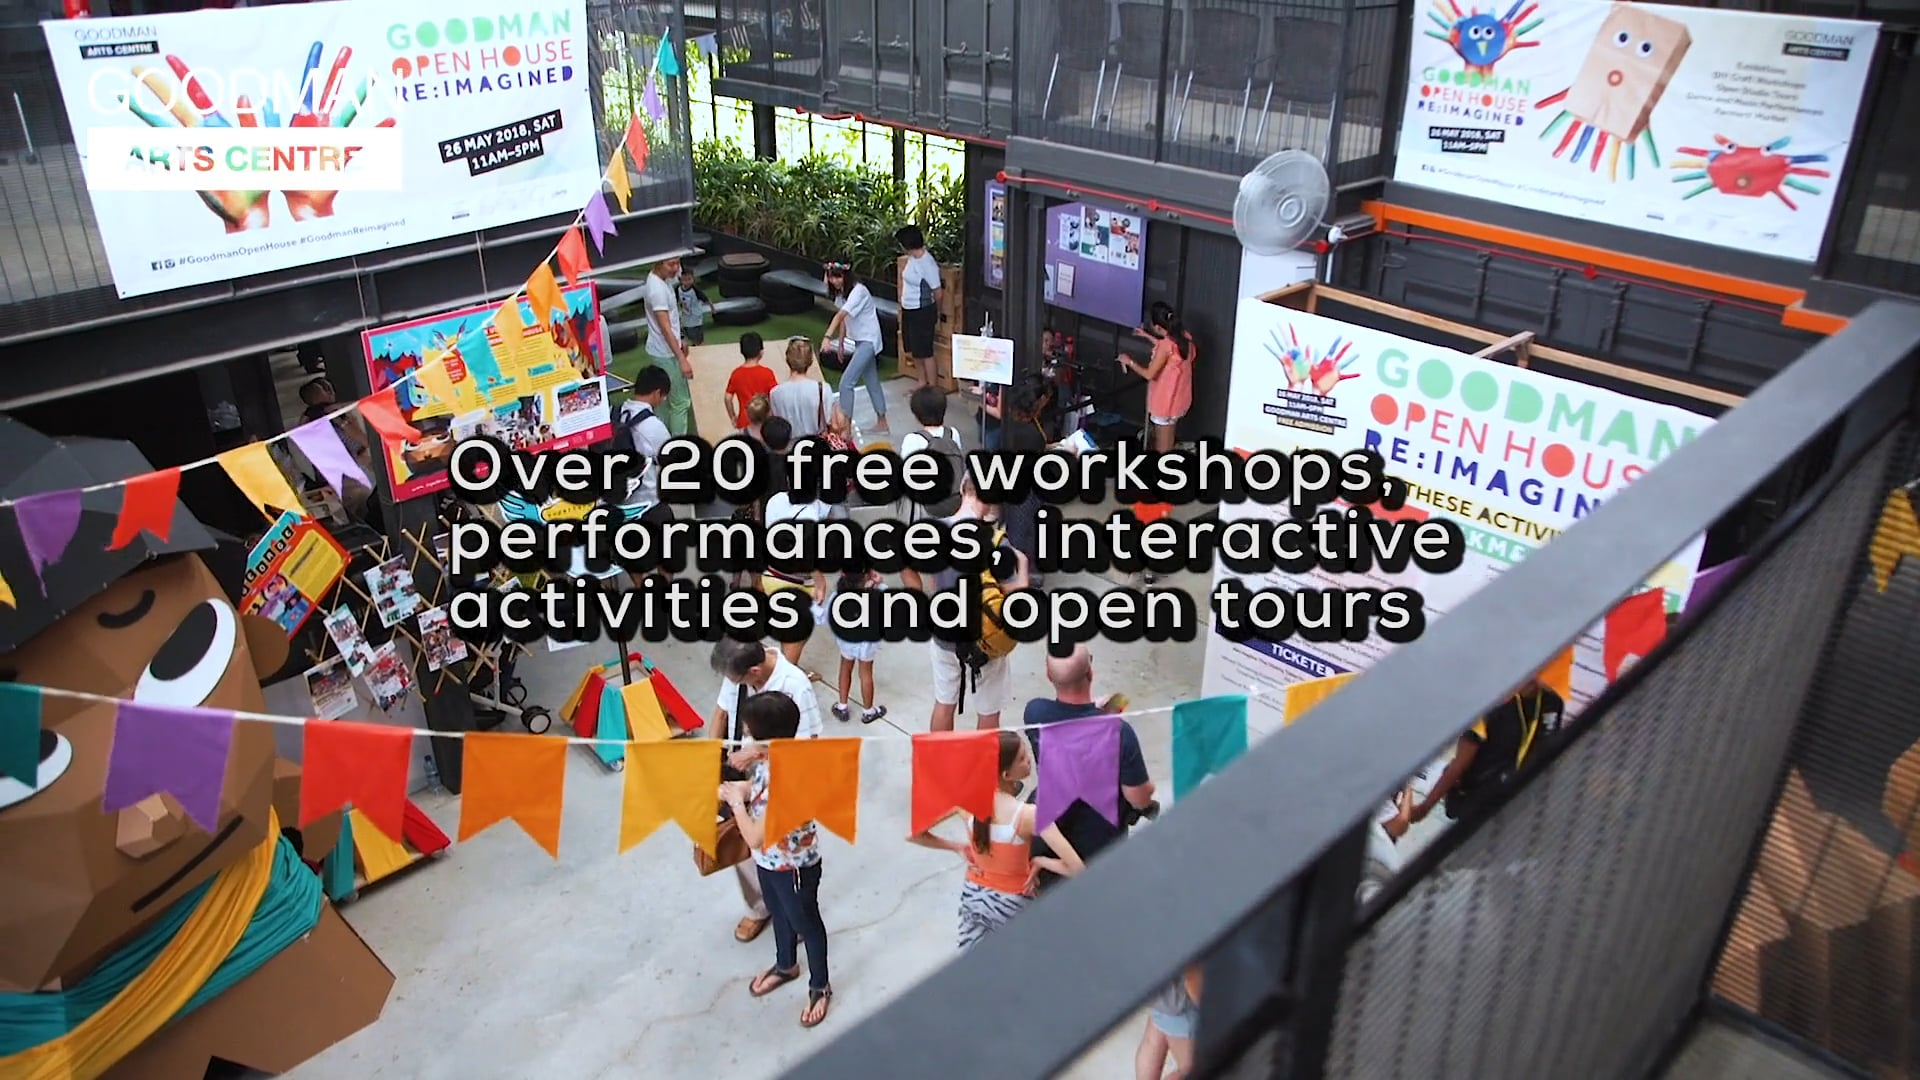 Goodman Open House RE-Imagine Event Trailer